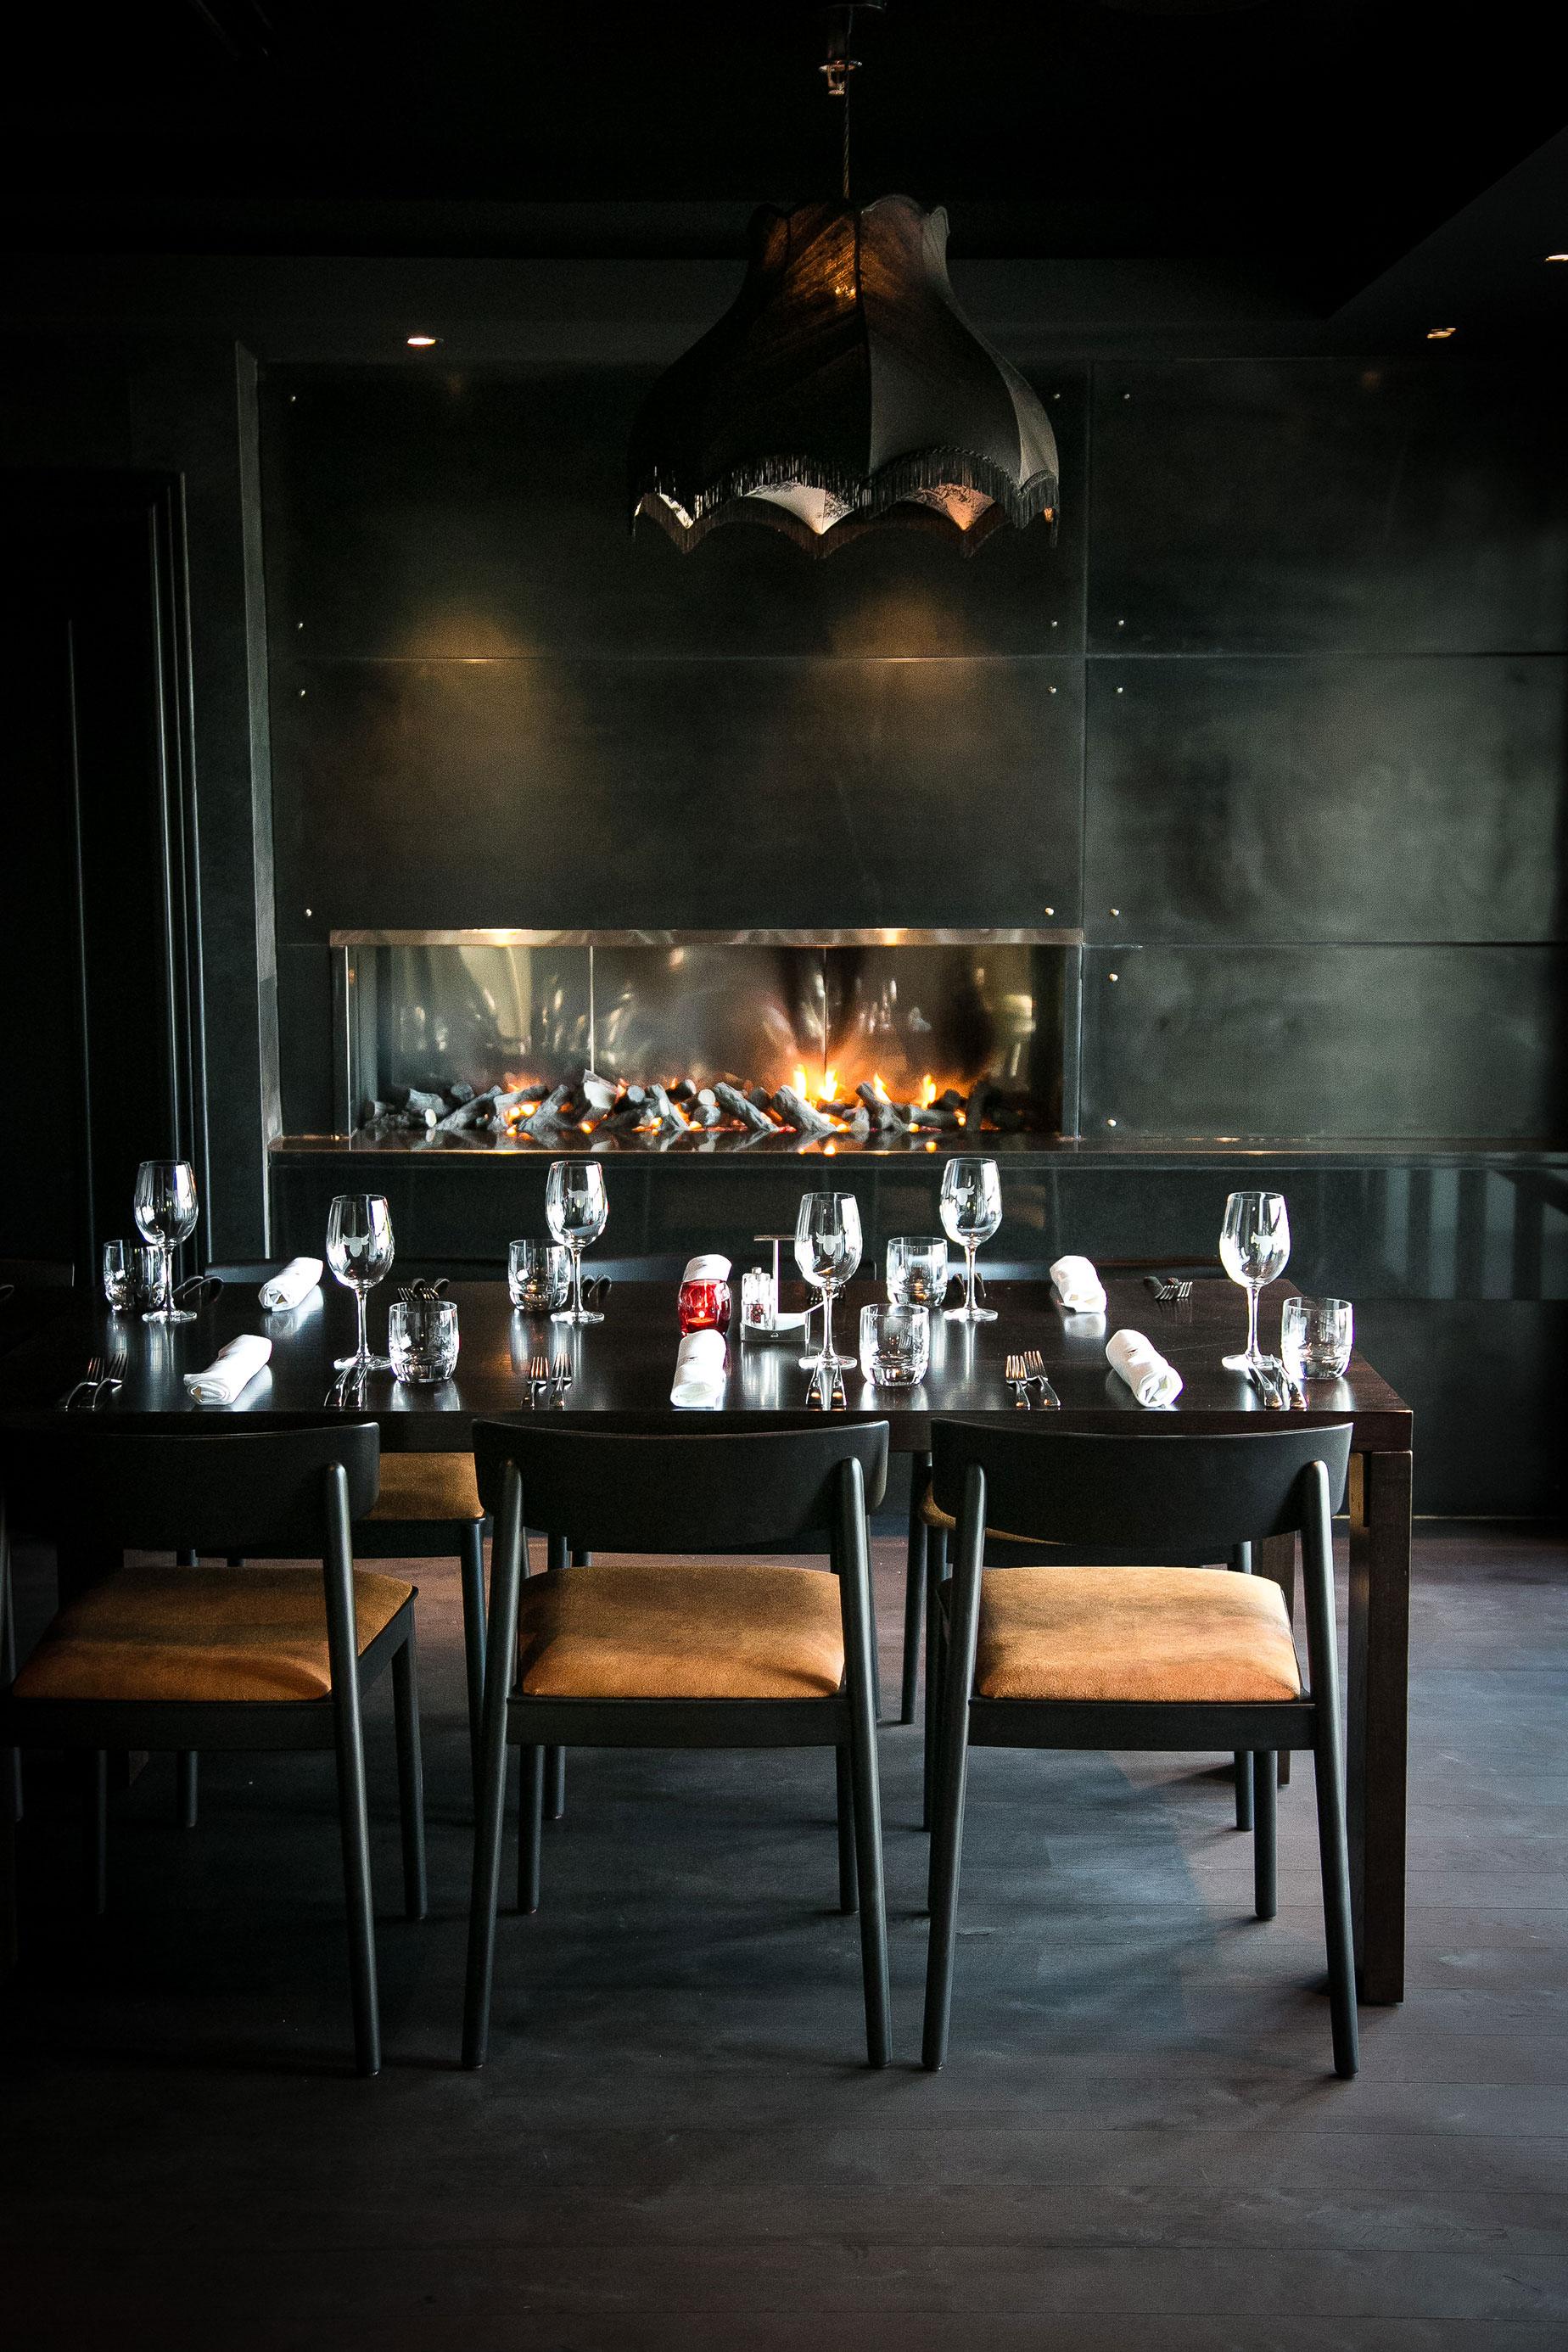 Jervois Steak House 6